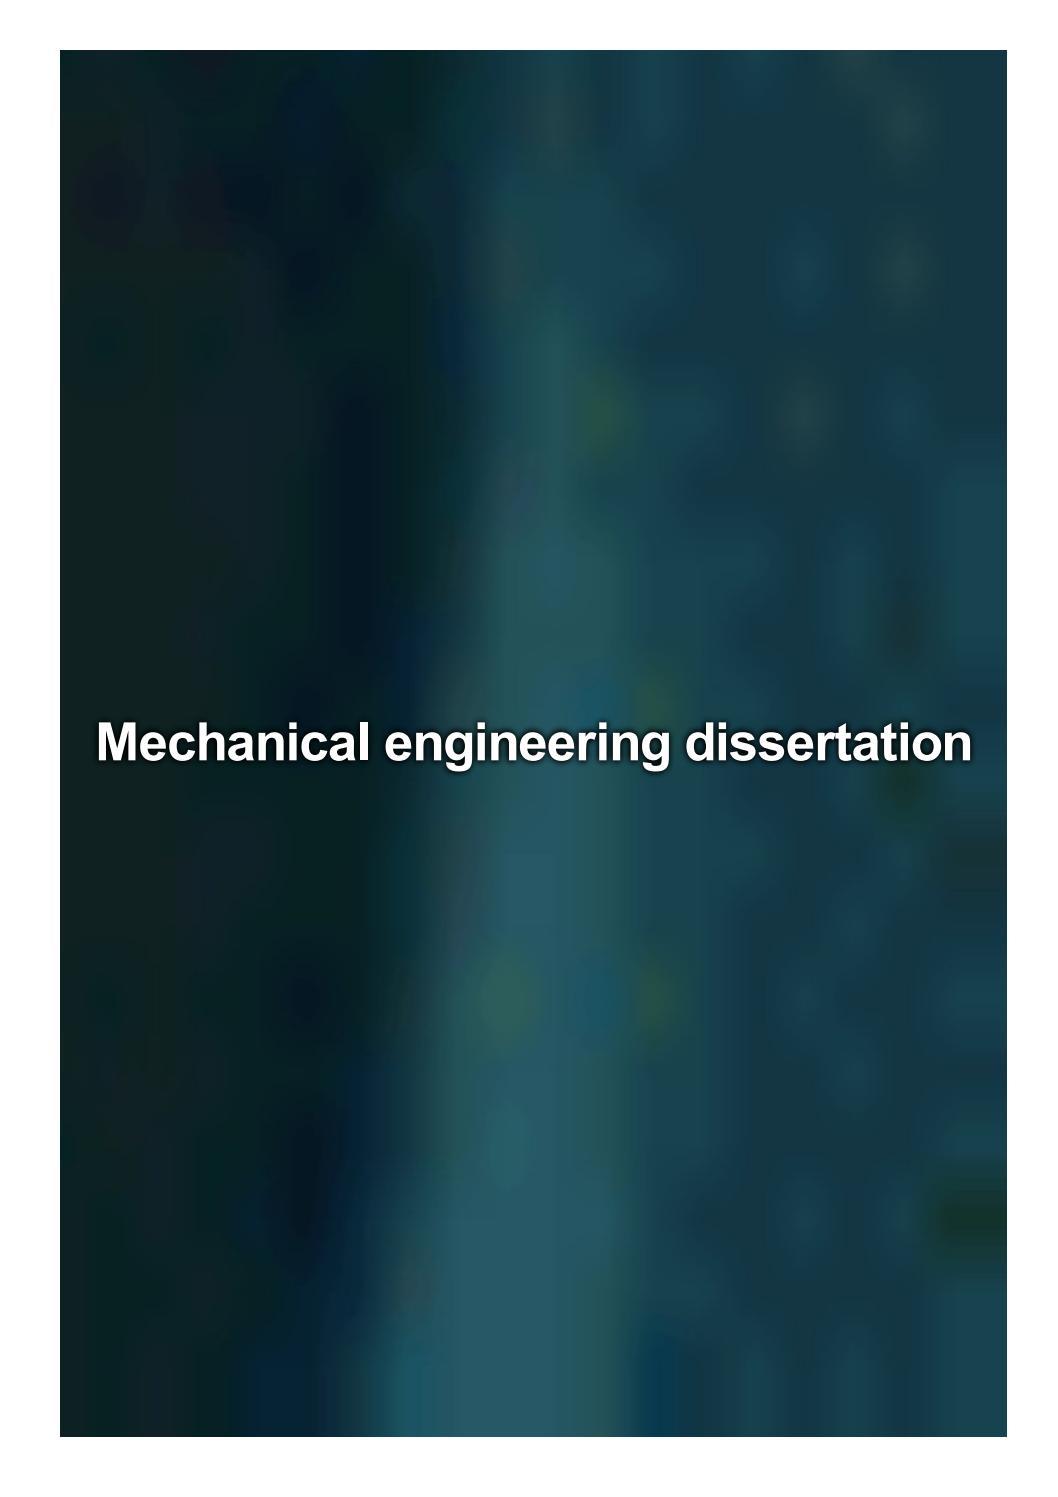 Mechanical engineering dissertation dissertation writing assistance